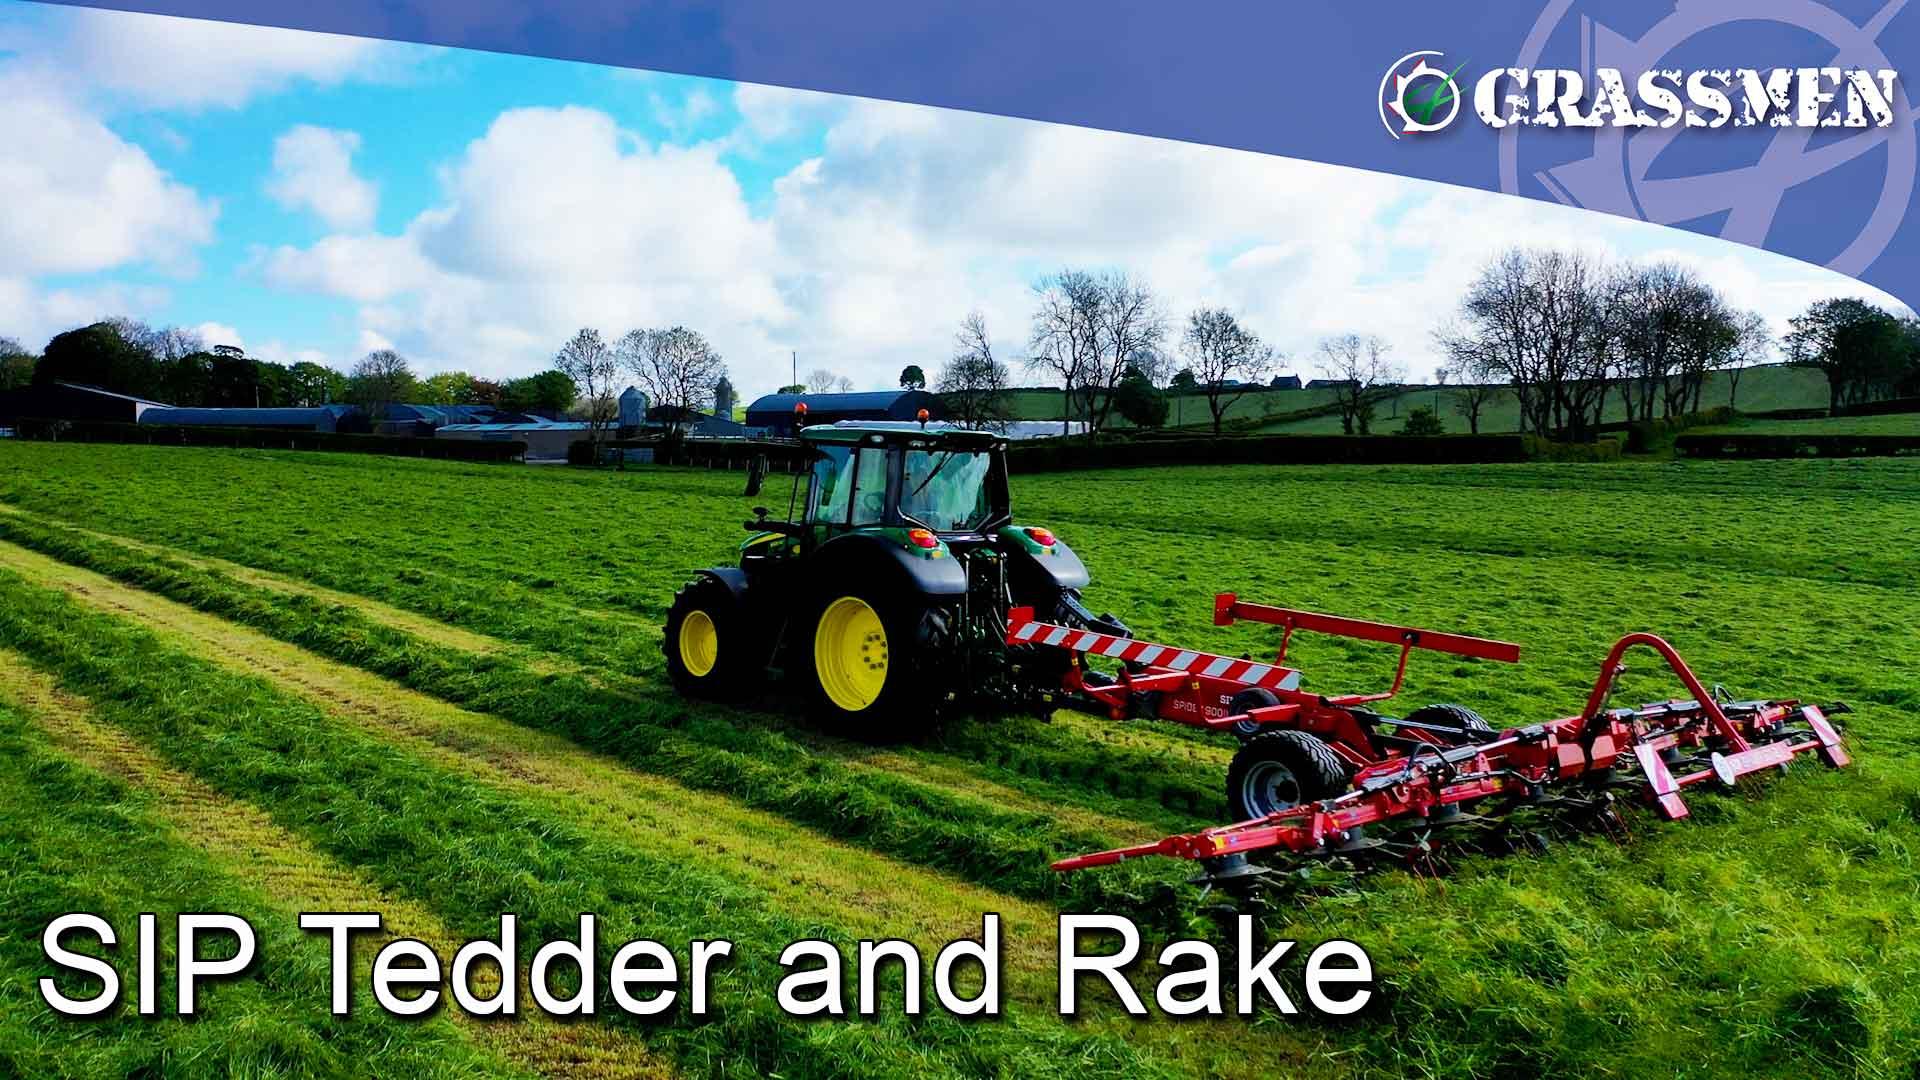 SIP Tedder and Rake - GRASSMEN